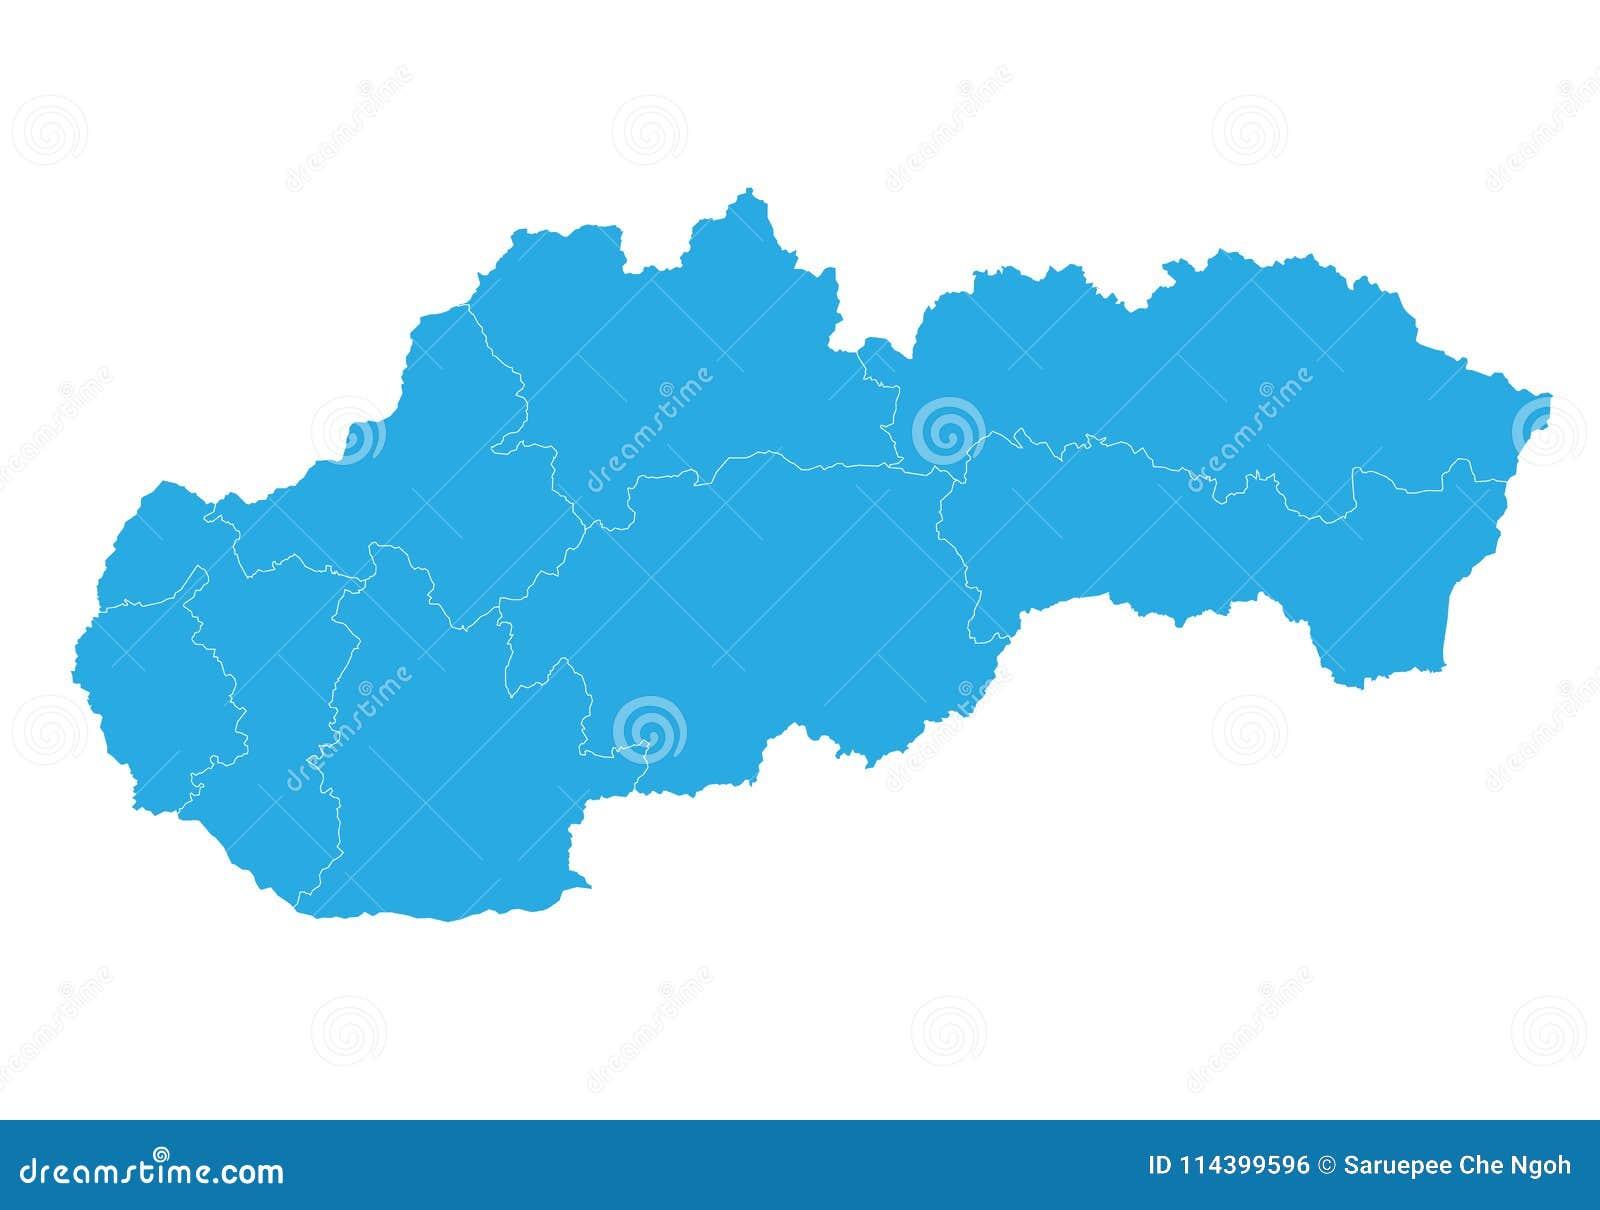 Map Of Slovakia. High Detailed Vector Map - Slovakia. Stock Vector ...